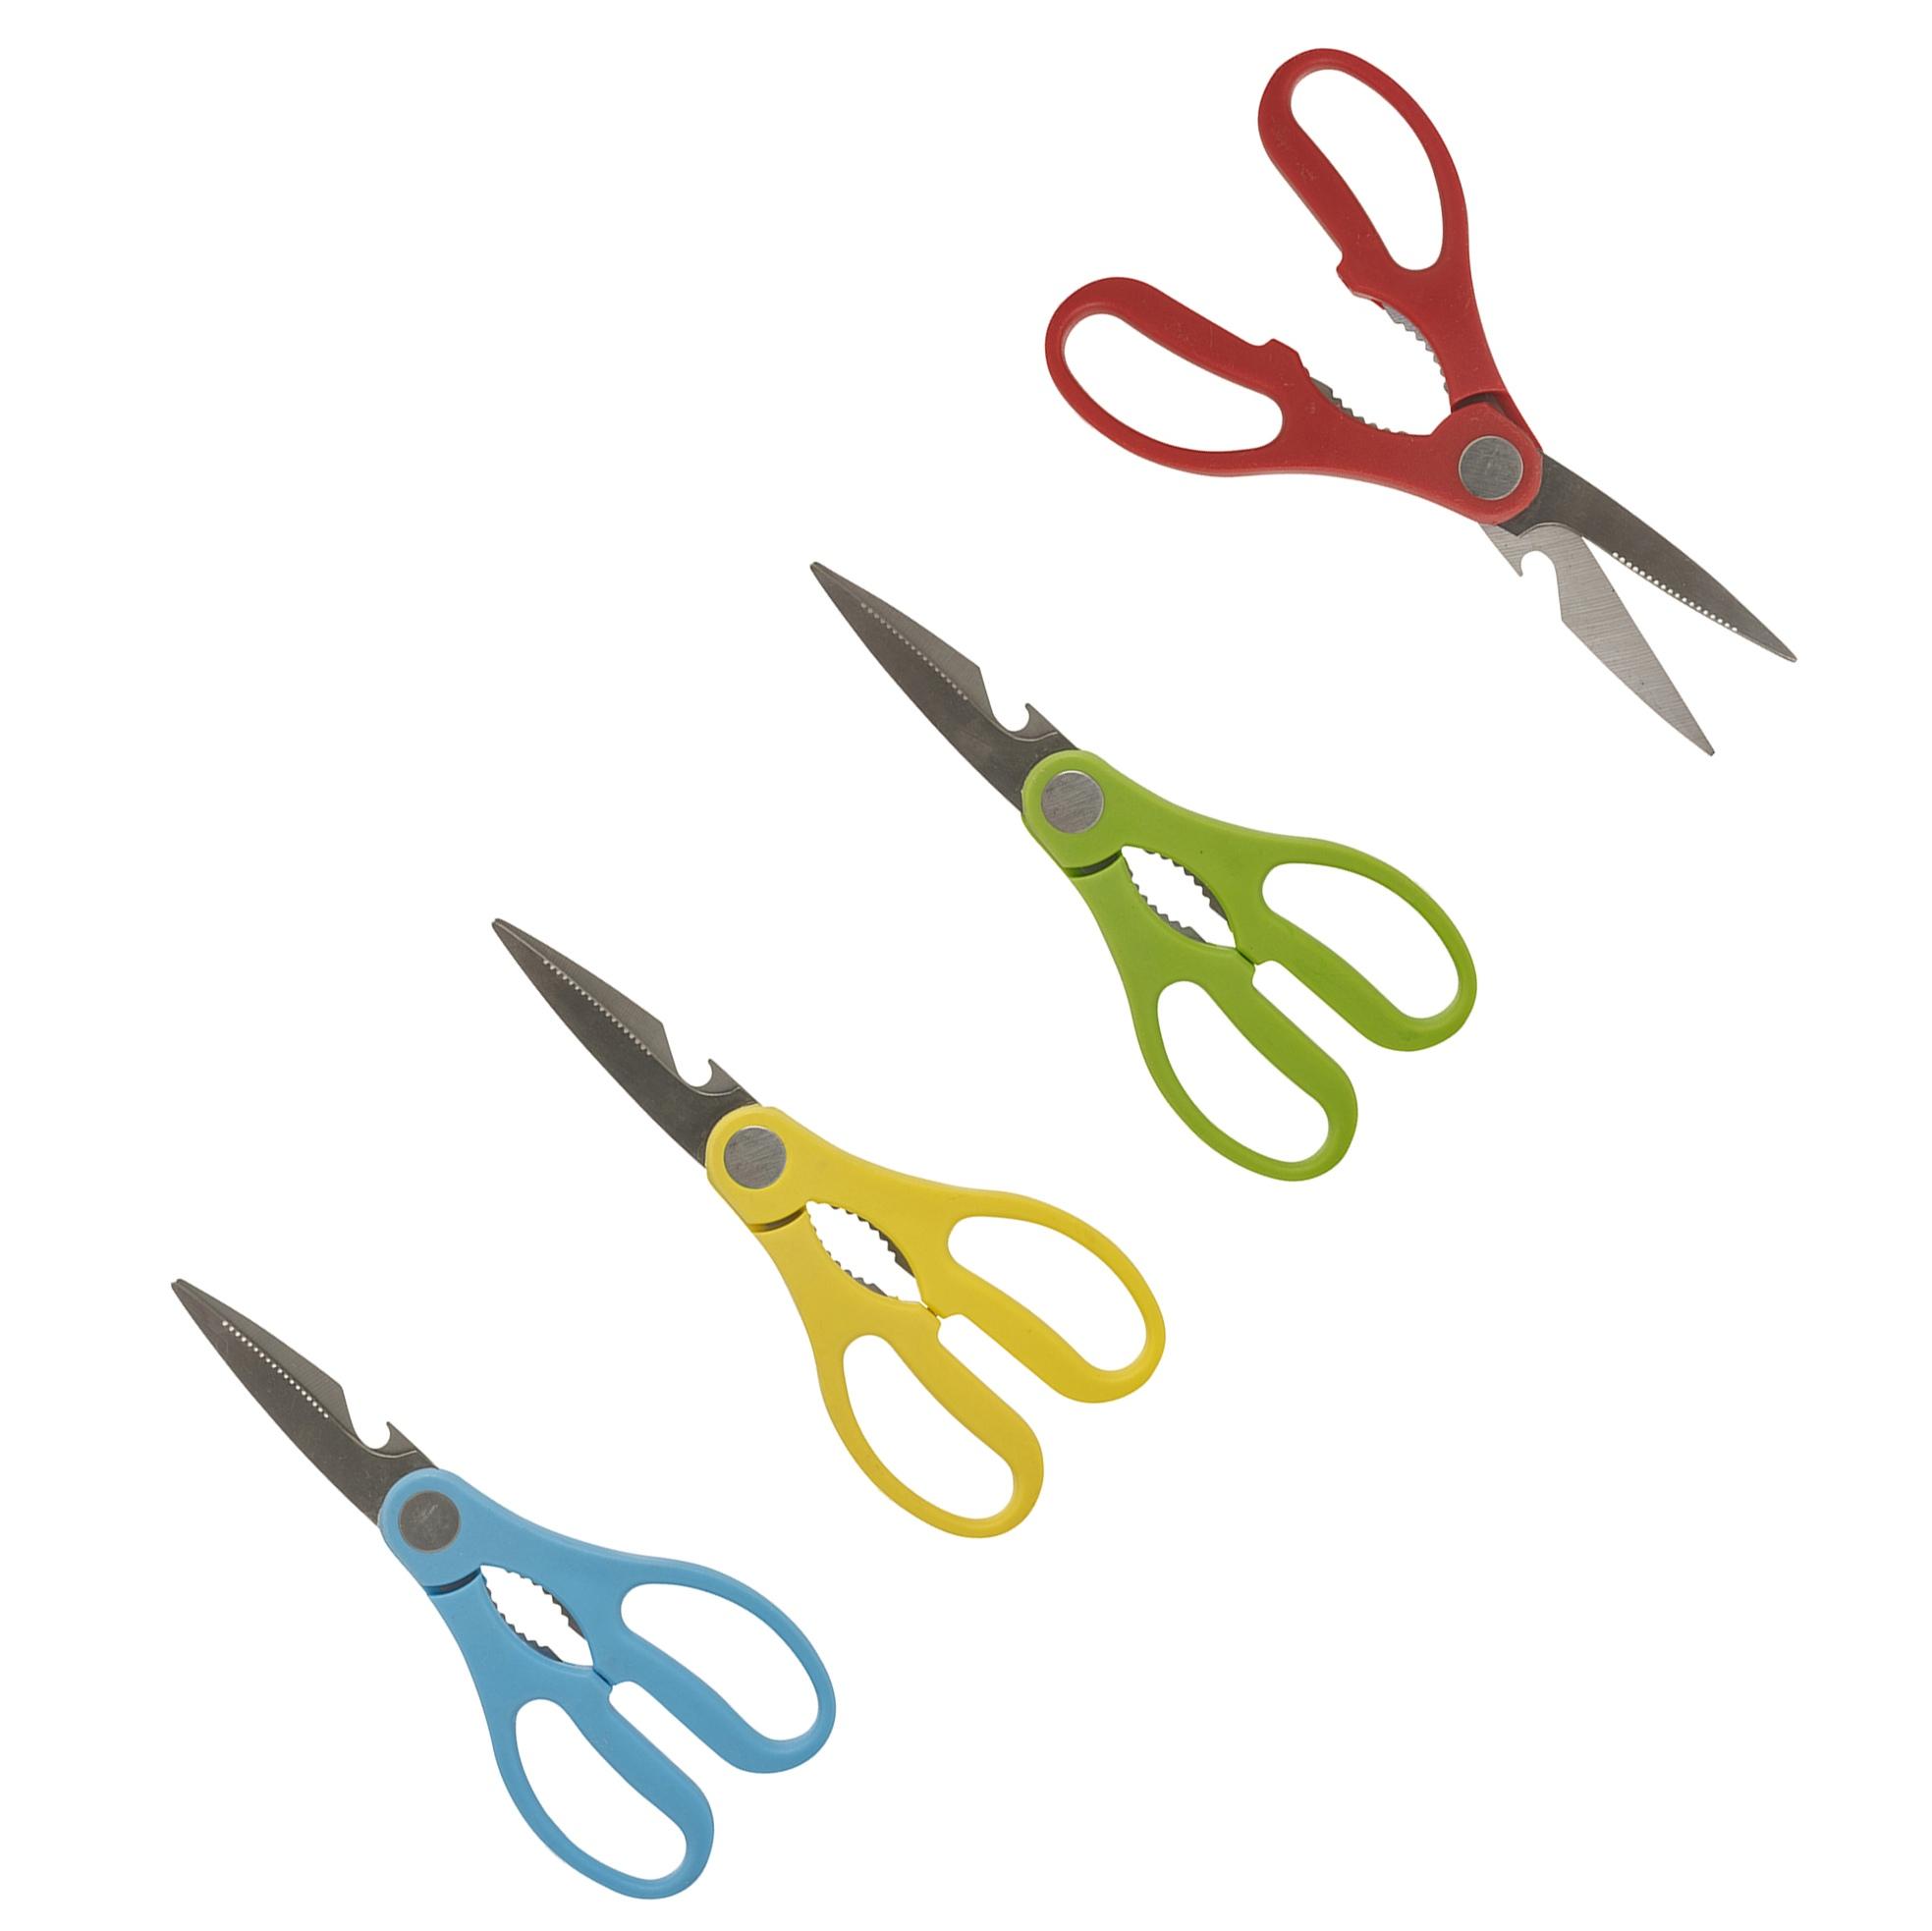 right or left handed stainless steel kitchen multi tool scissors bottle opener ebay. Black Bedroom Furniture Sets. Home Design Ideas